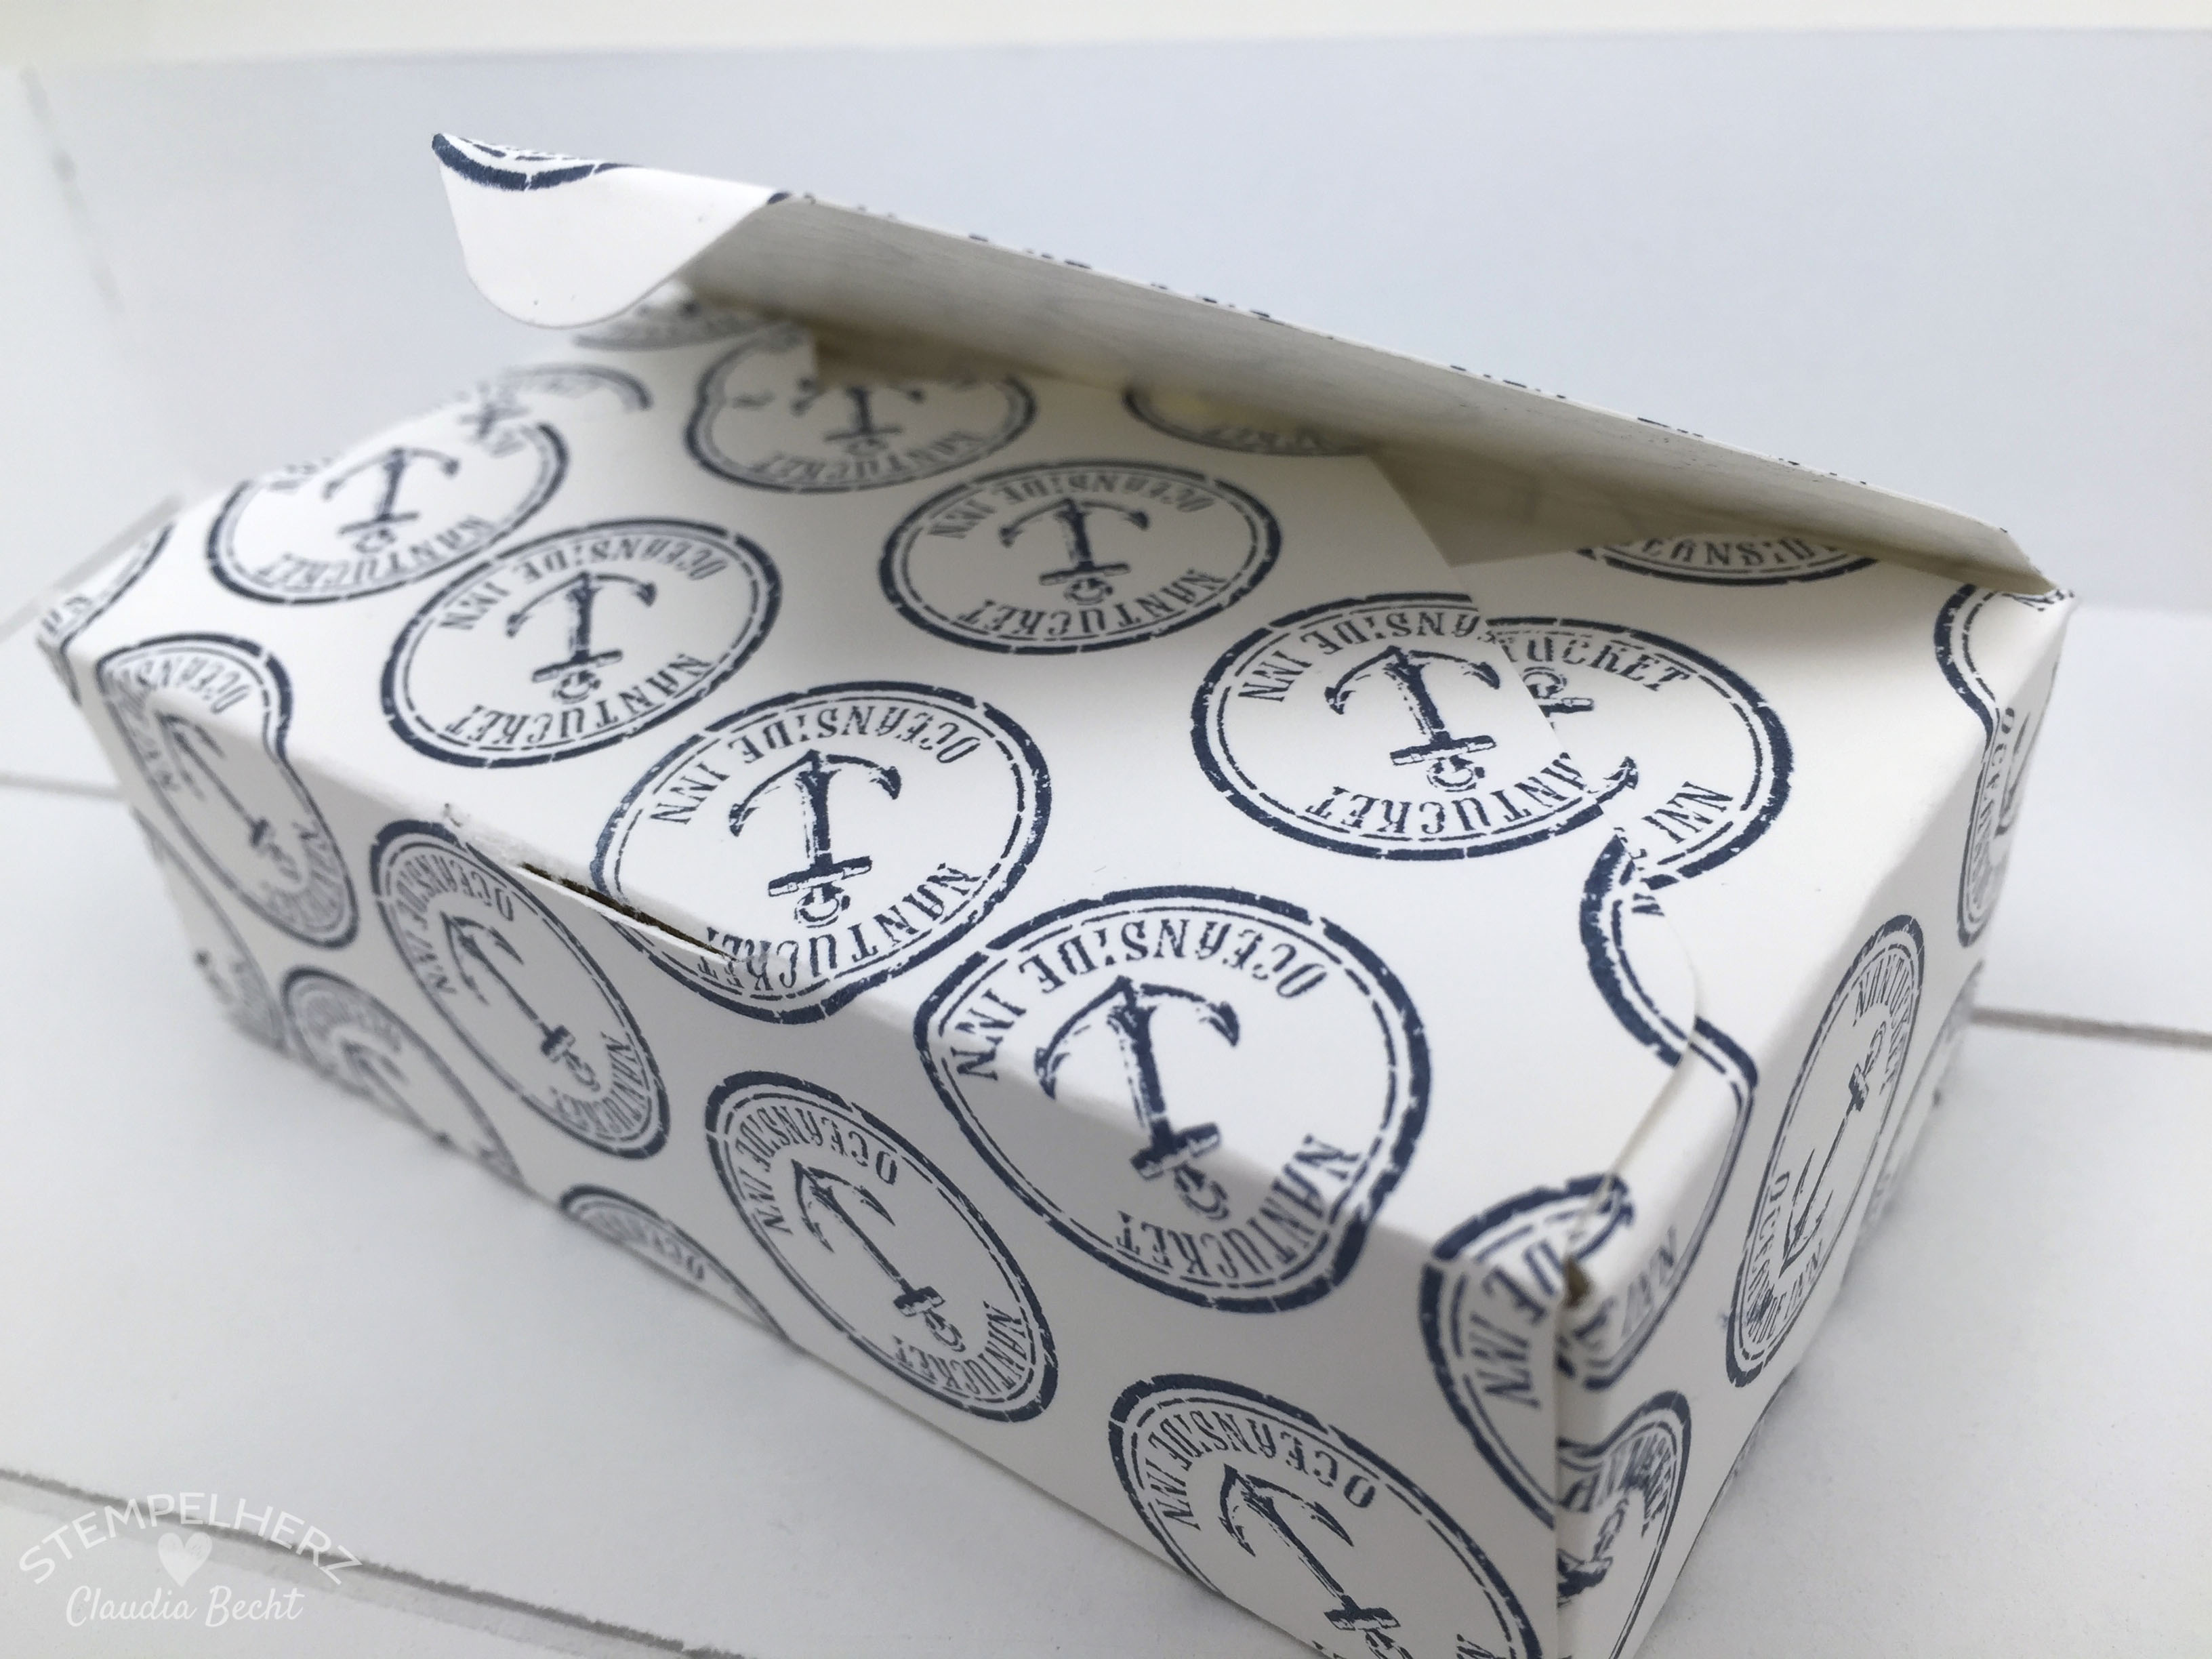 Stampin Up-Stempelherz-Boxen-Verpackung-Ach du meine Gruesse-By the Tide-Verpackung Lebe Lache Liebe 07